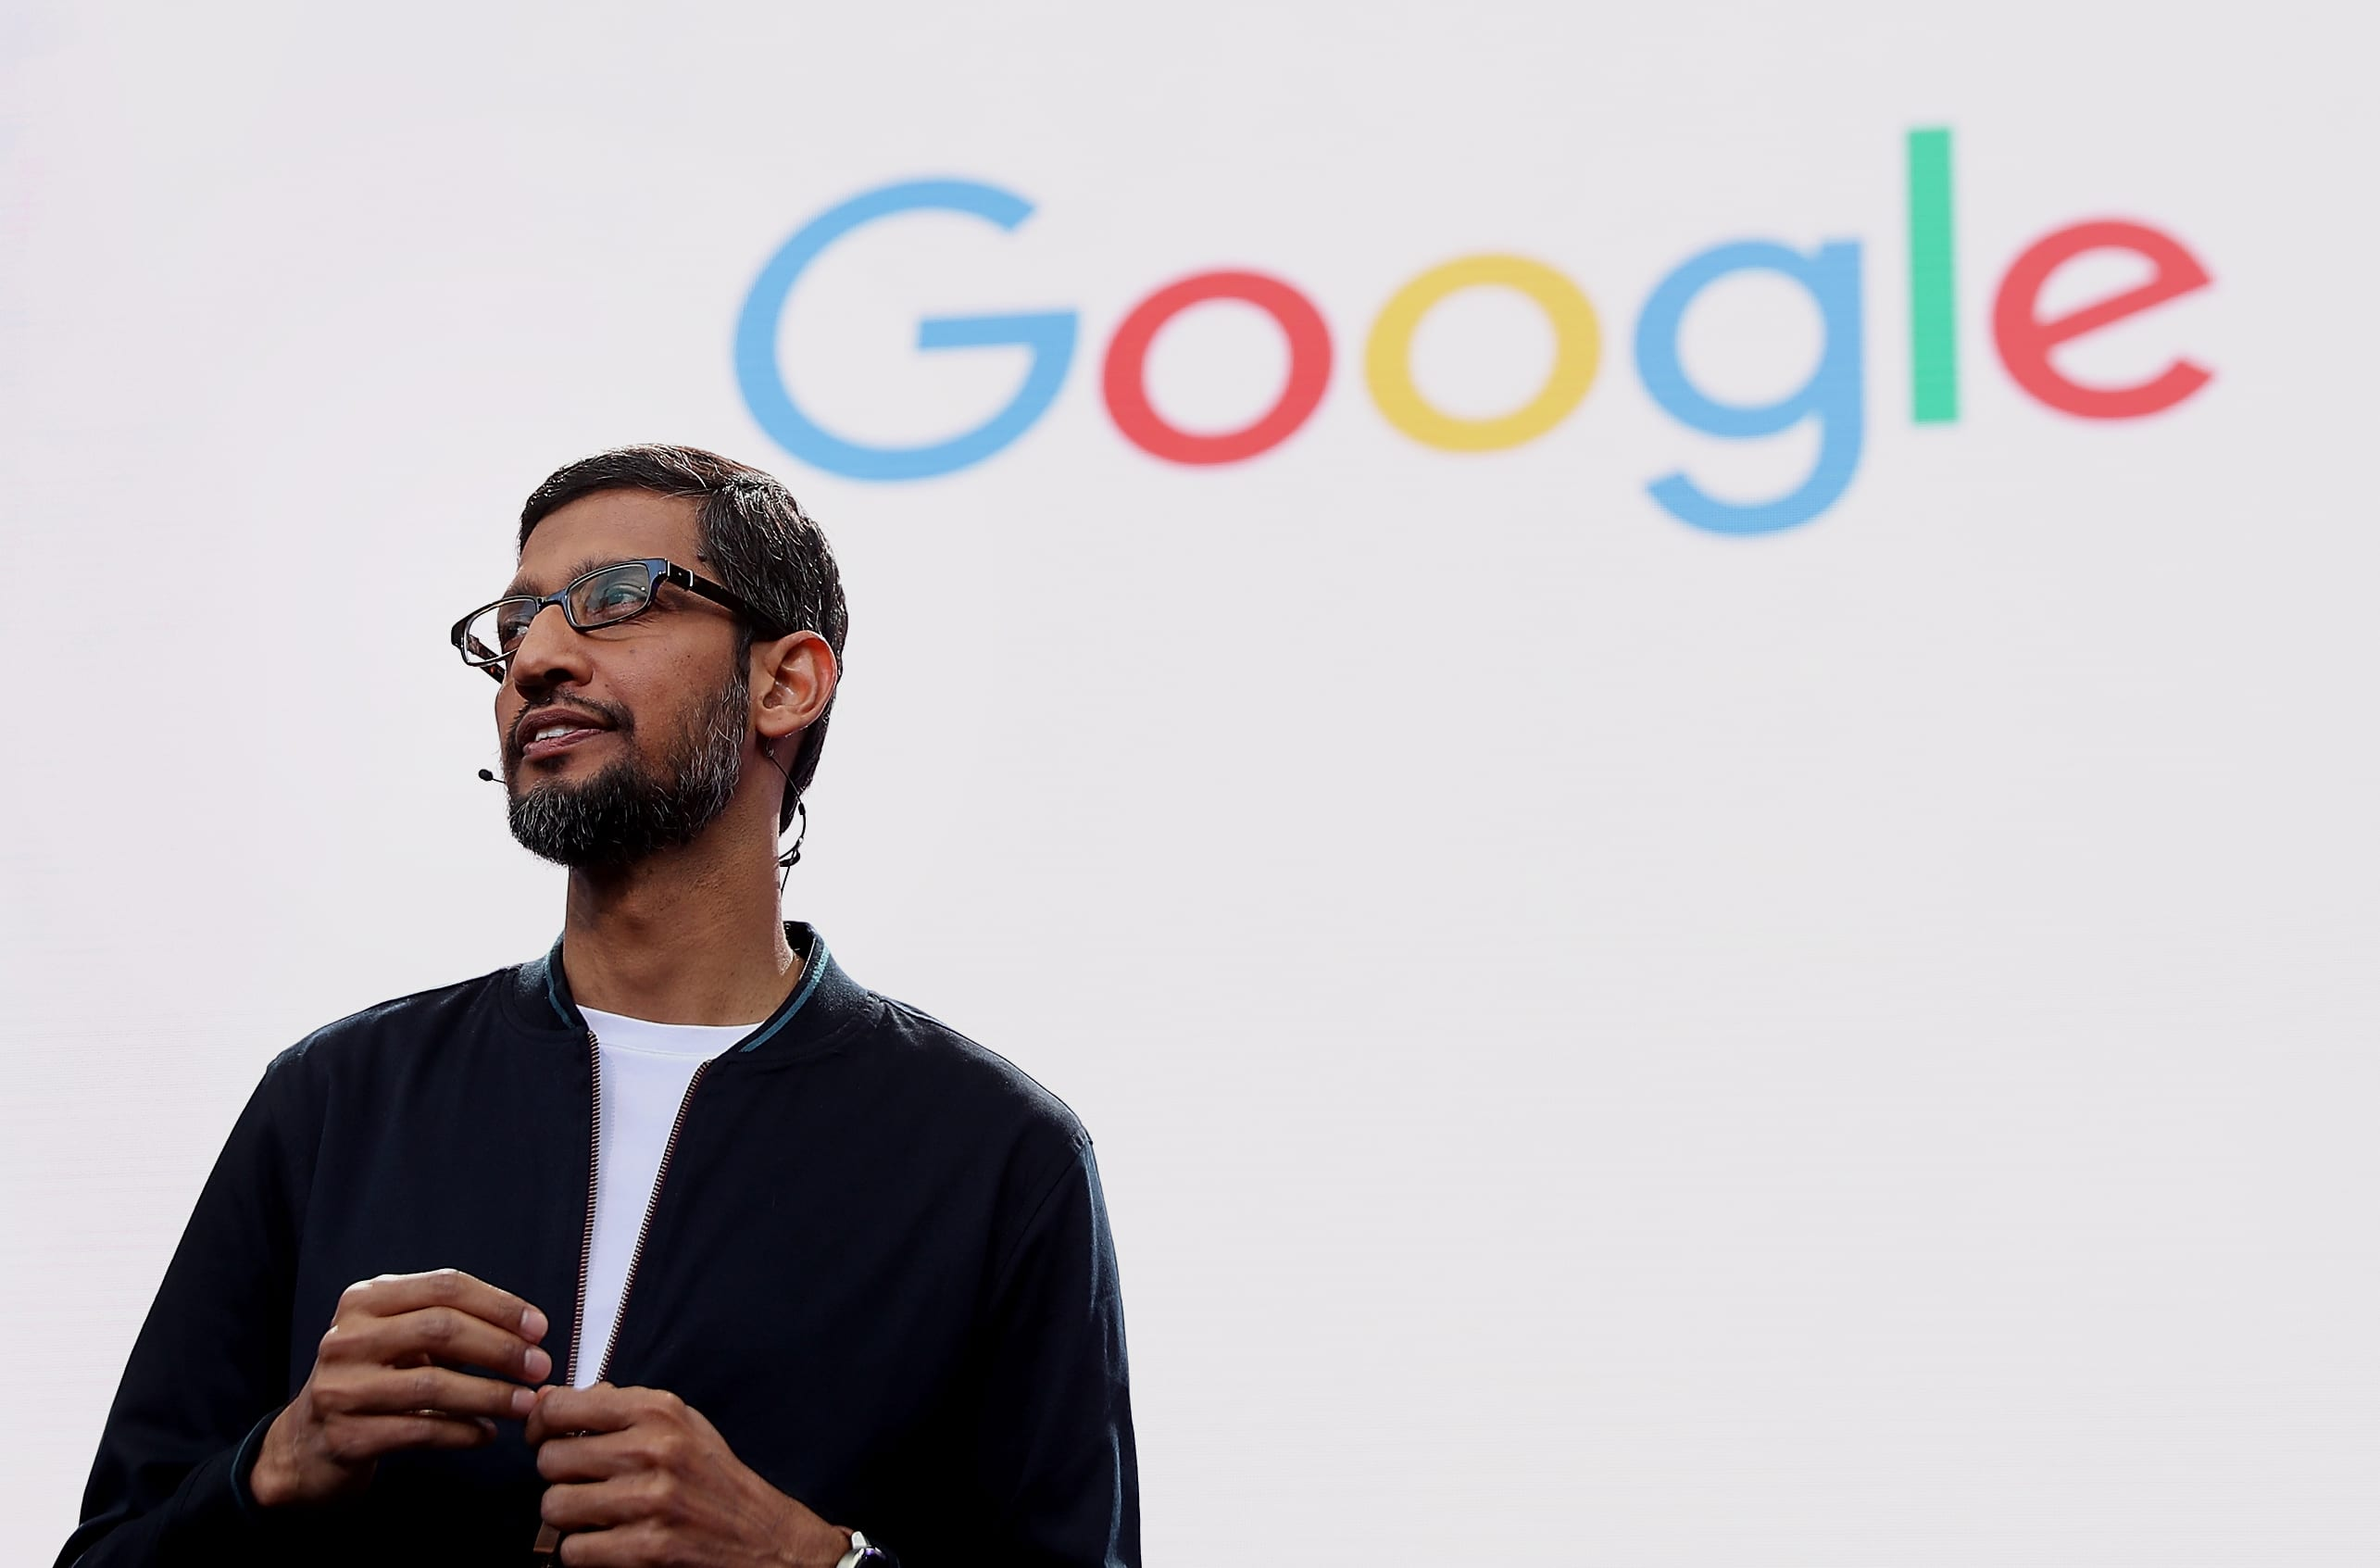 GP: Google CEO Sundar Pichai speaks during Google I/O 2016 at Shoreline Amphitheatre